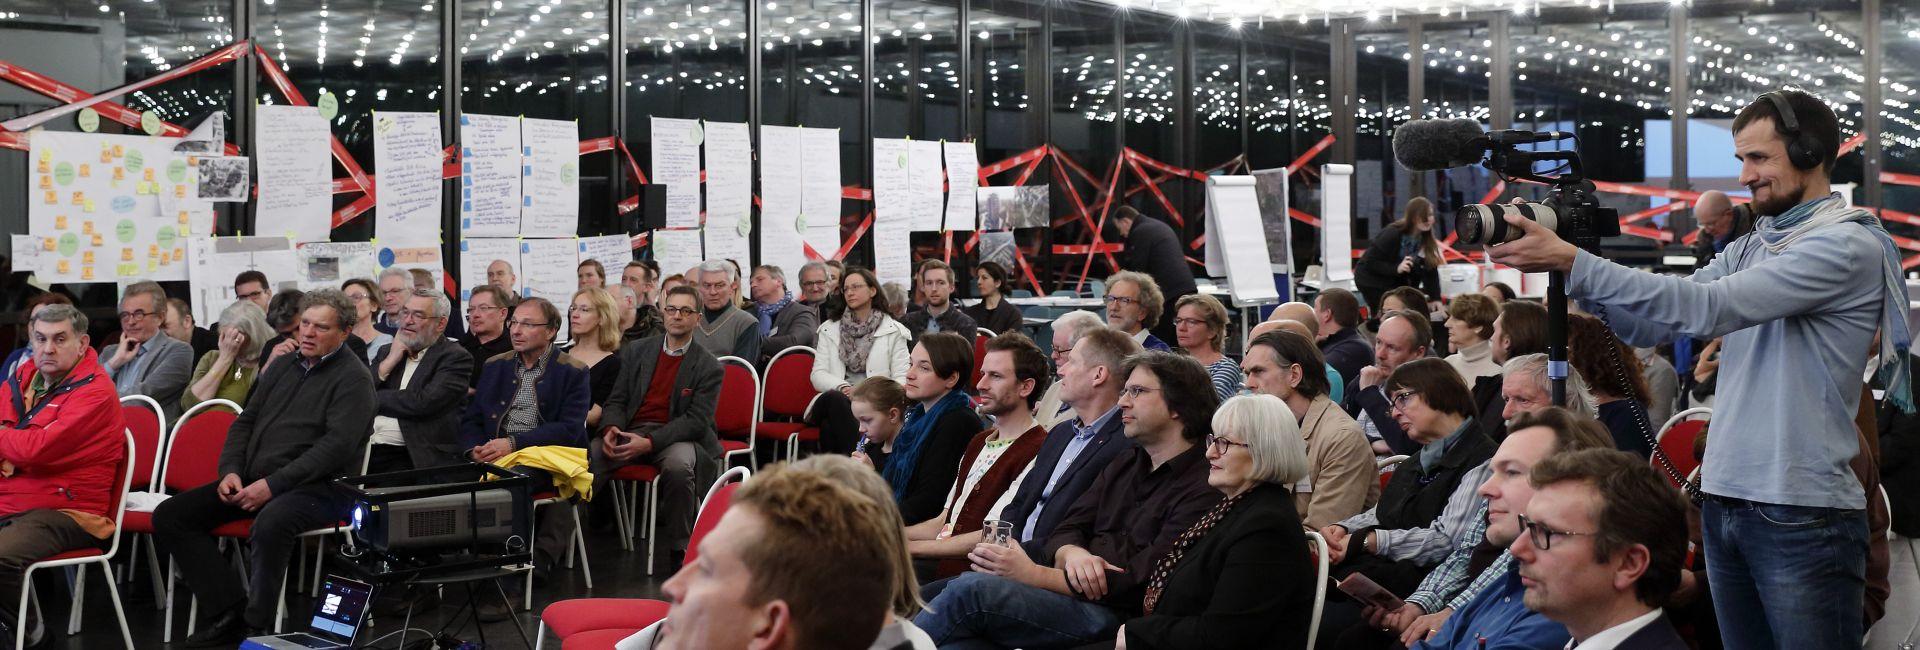 Bürgerbeteiligung im Gange; Foto: Stadt Regensburg